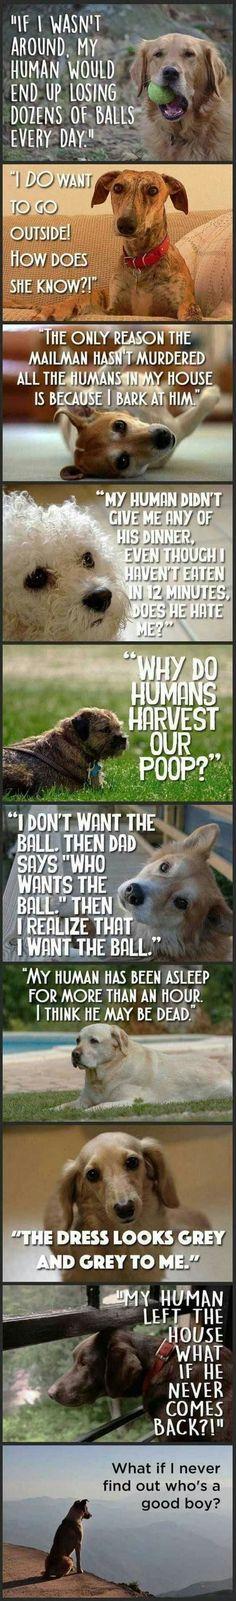 Mysterious doggos Memes